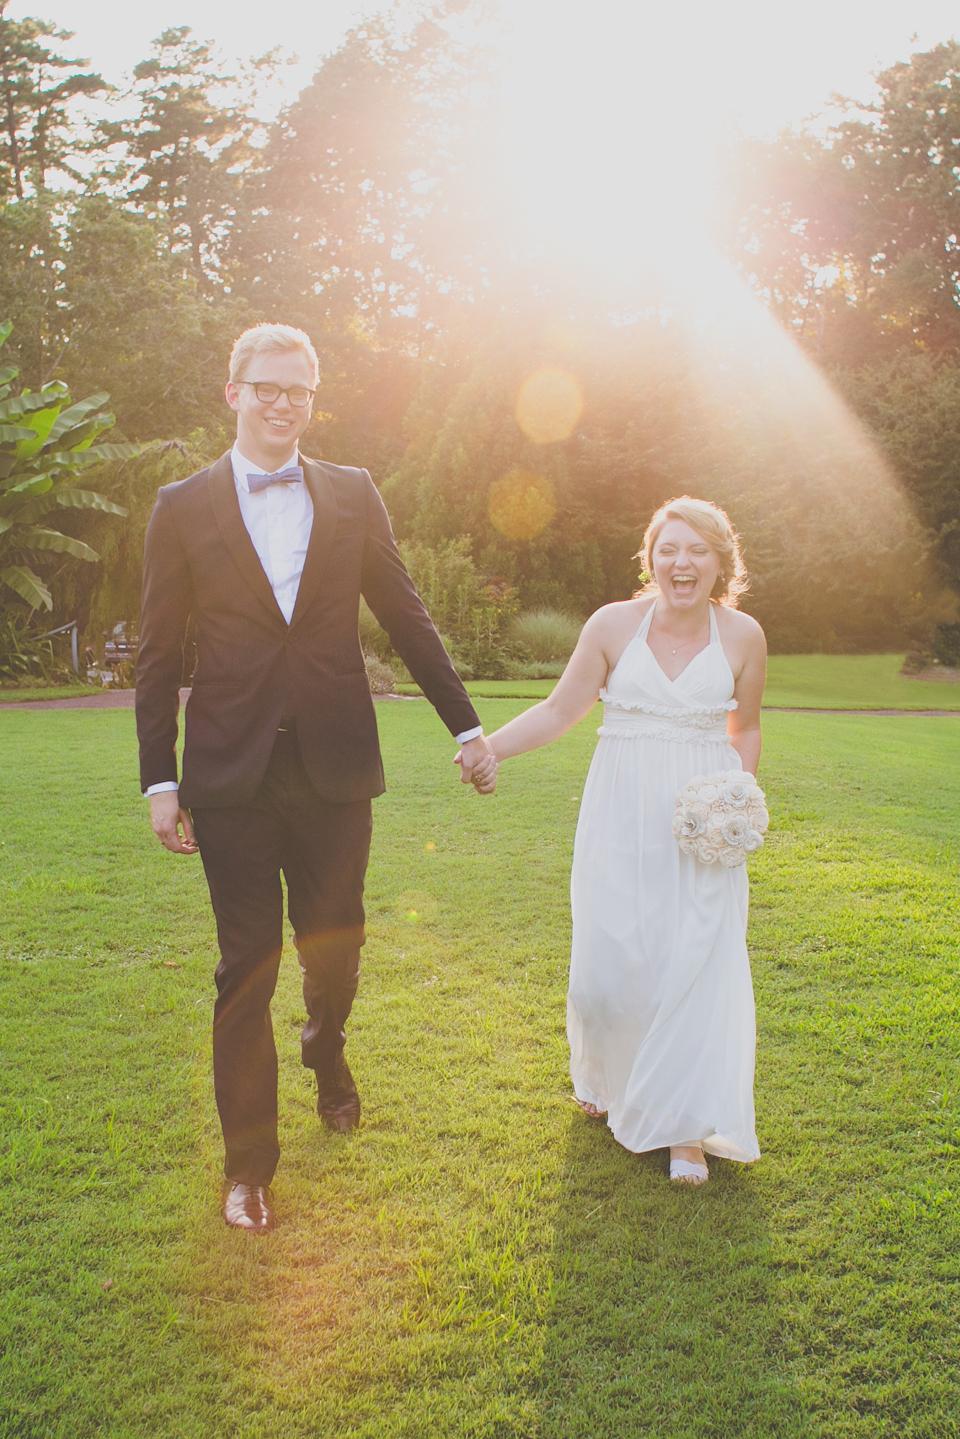 amp_weddings2016_051.jpg